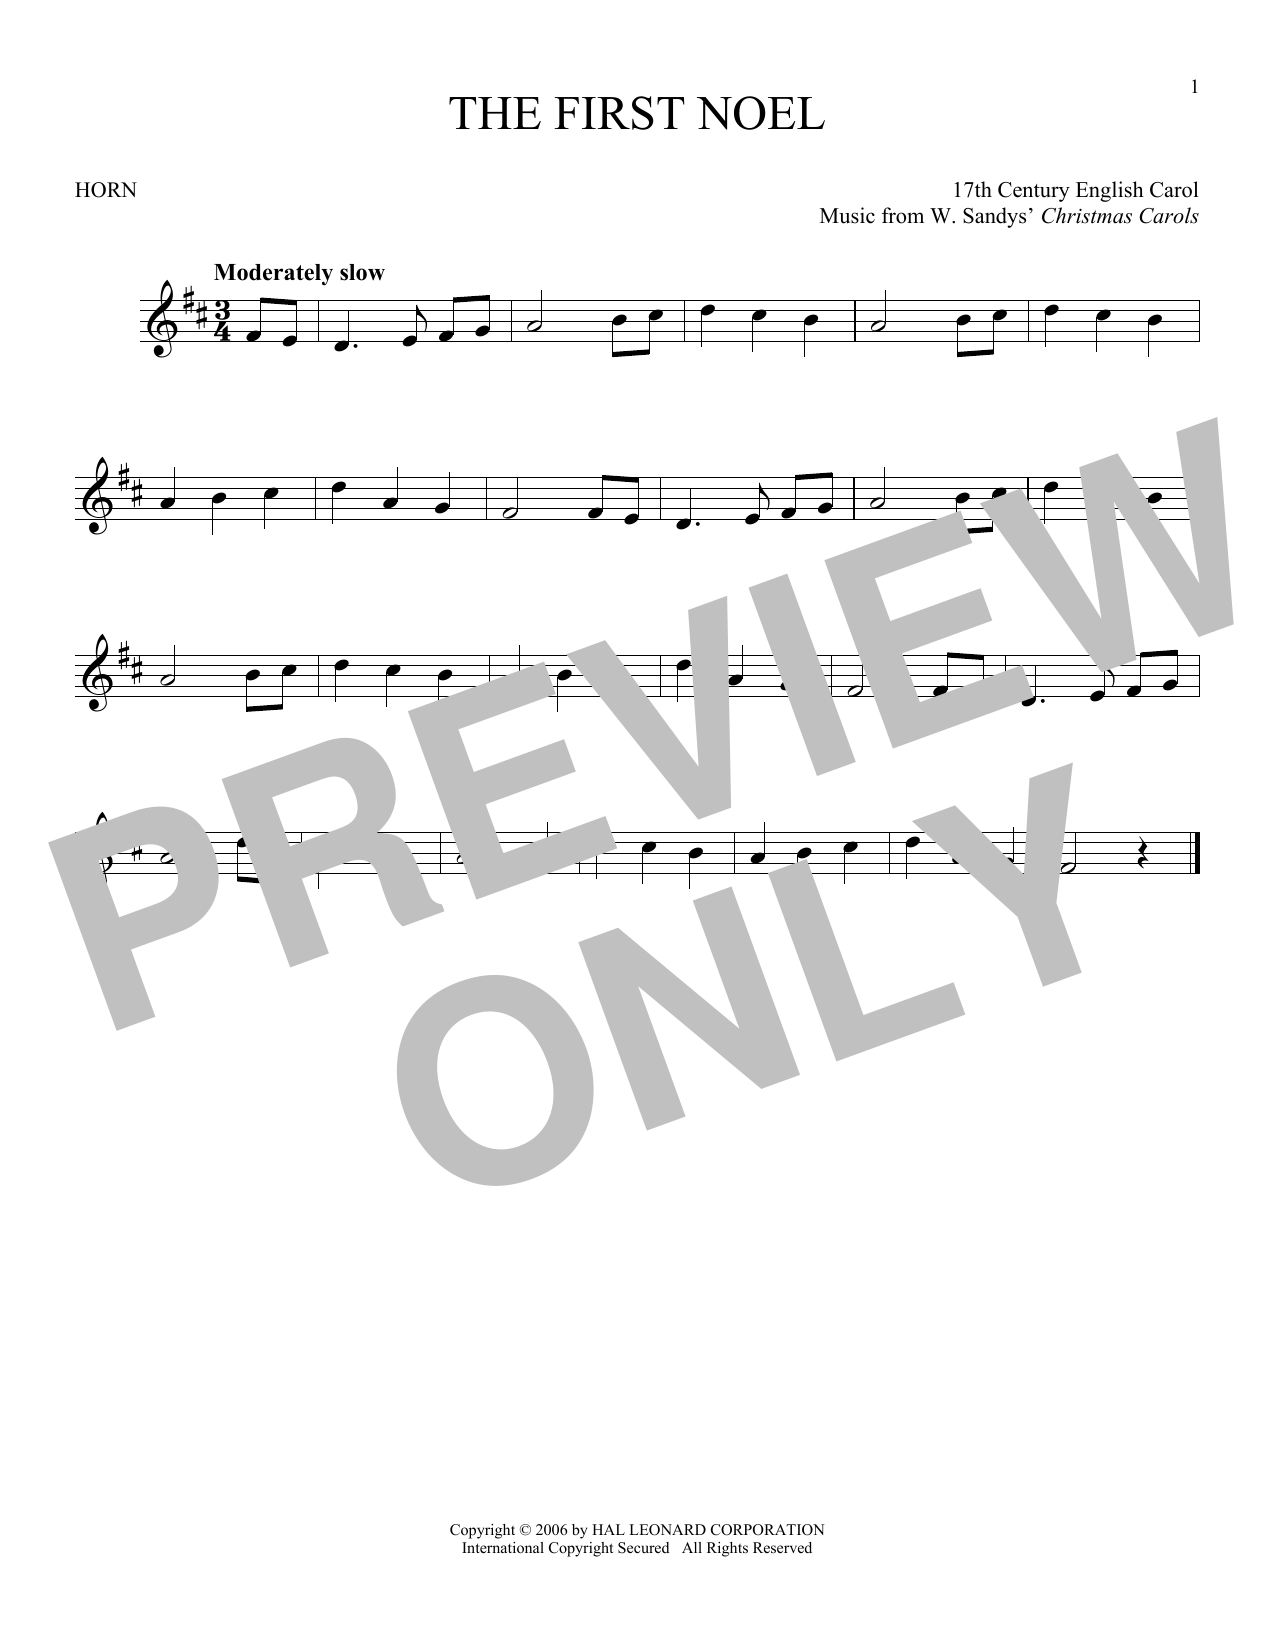 Christmas Carol Music.The First Noel By W Sandys Christmas Carols French Horn Solo Digital Sheet Music